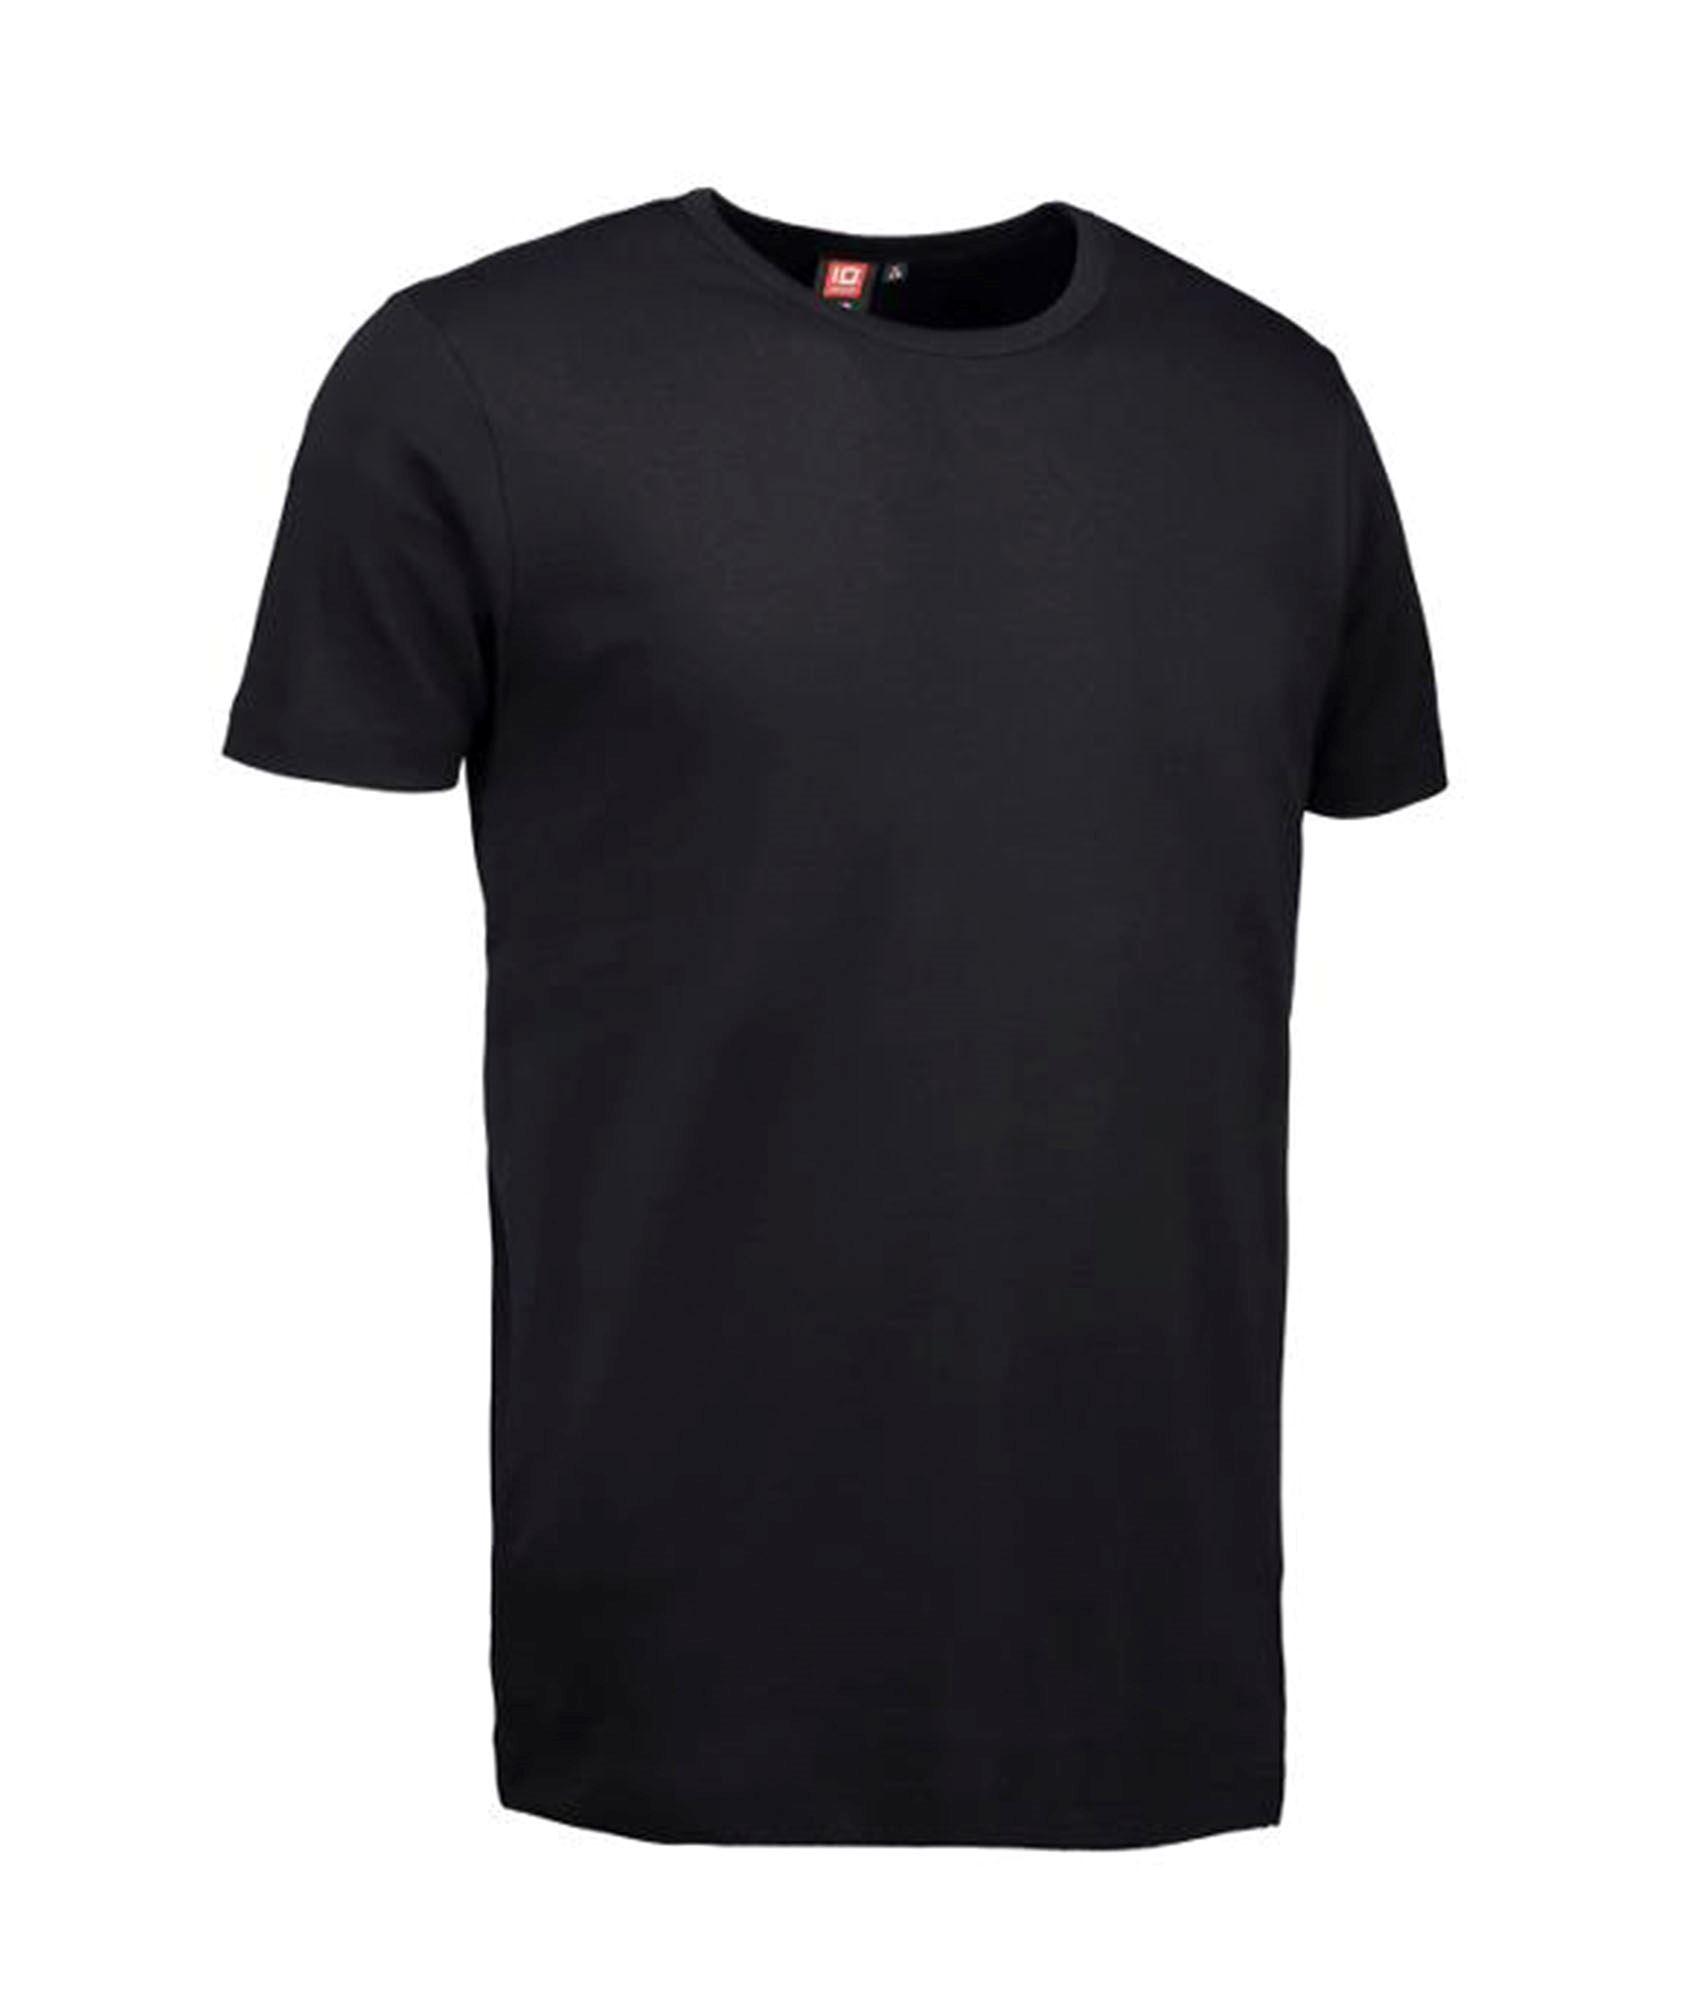 ID Rib herre t shirt, sort